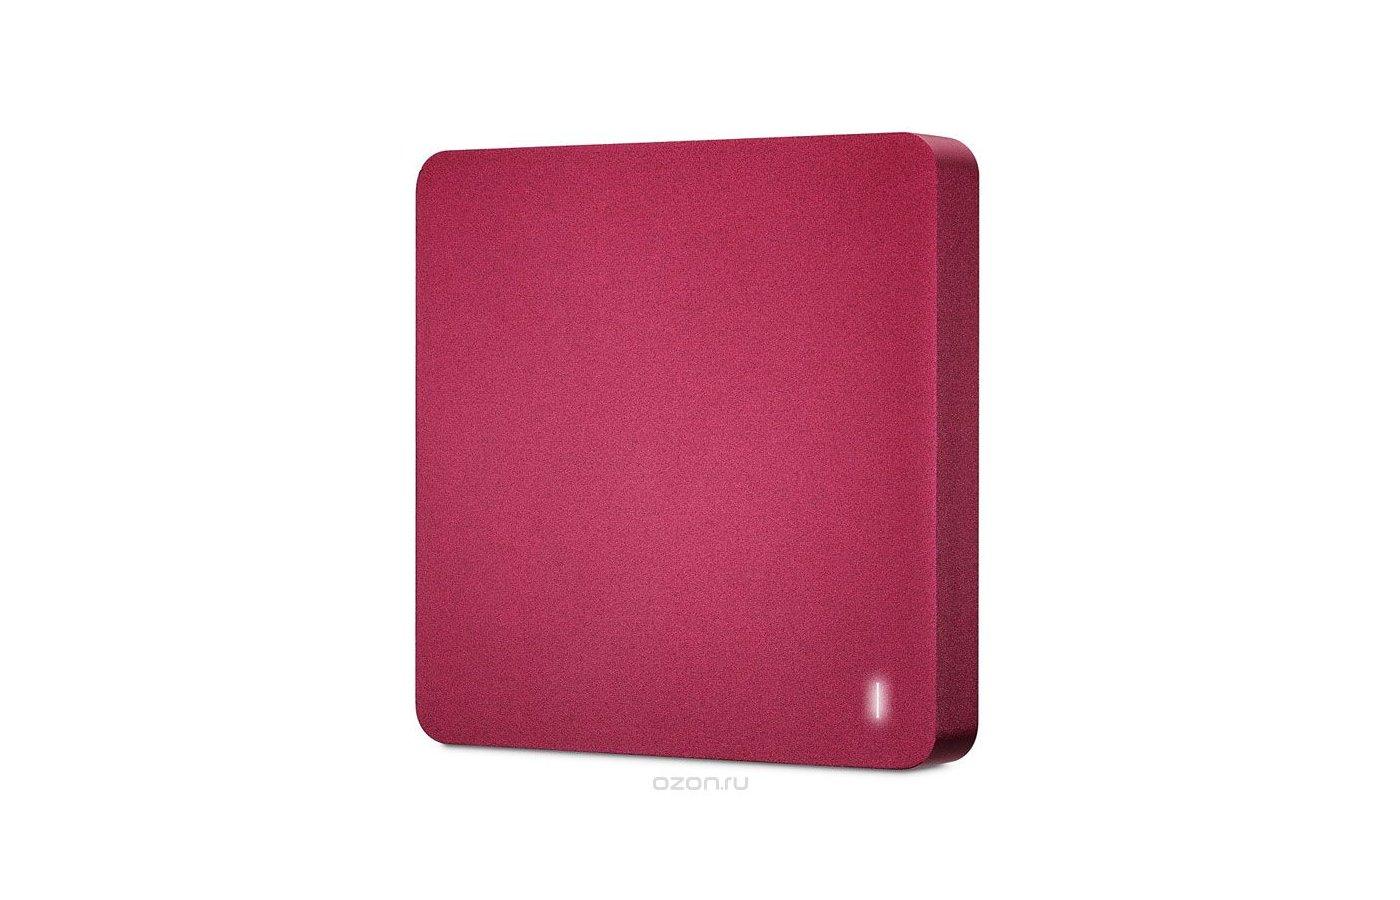 Портативный аккумулятор Calibre ULTRA GO MINI RED 3500 mAh FUMI035R3